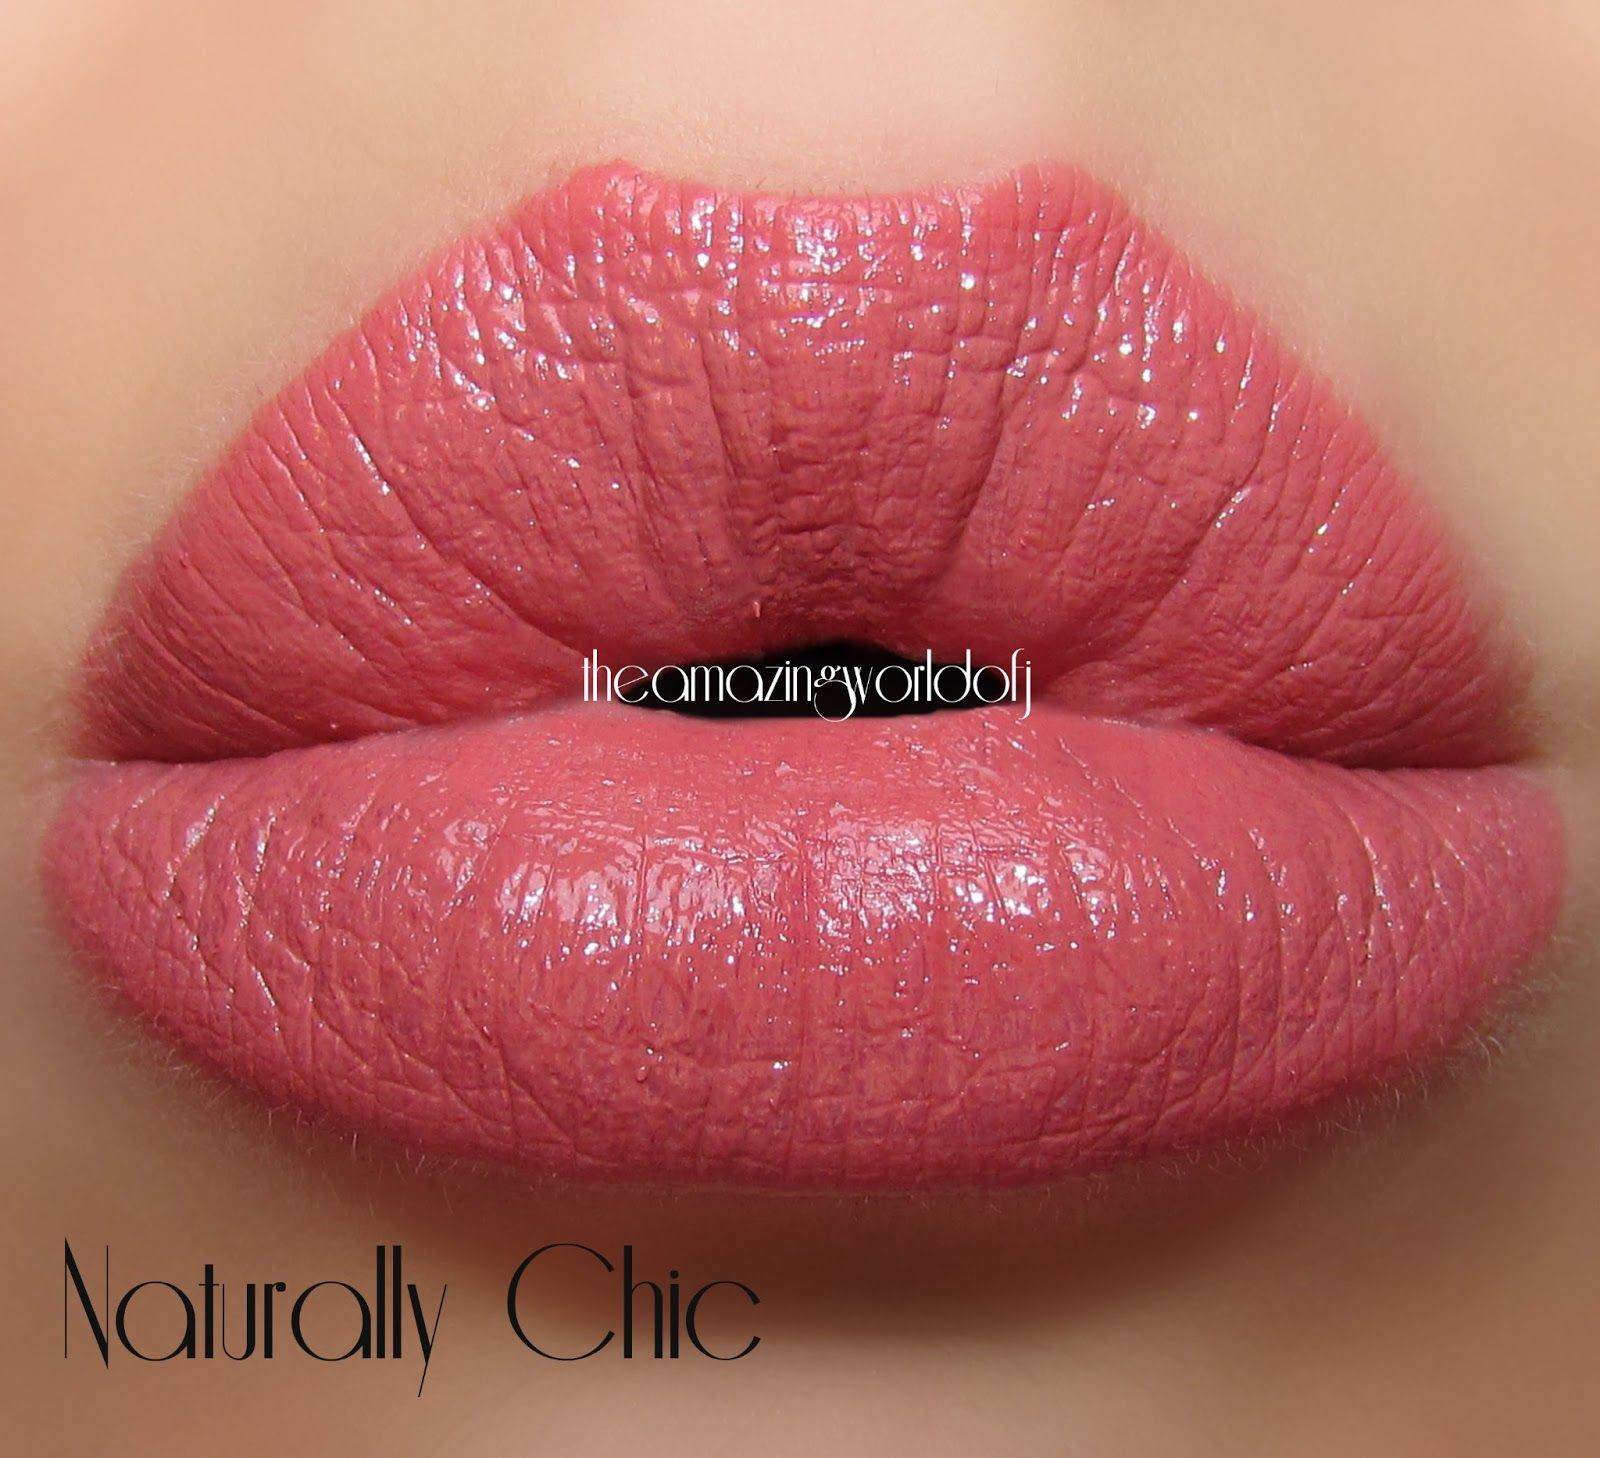 TheAmazingWorldOfJ: Milani COLORstatement Lipsticks Naturals & Browns - Review & Swatches